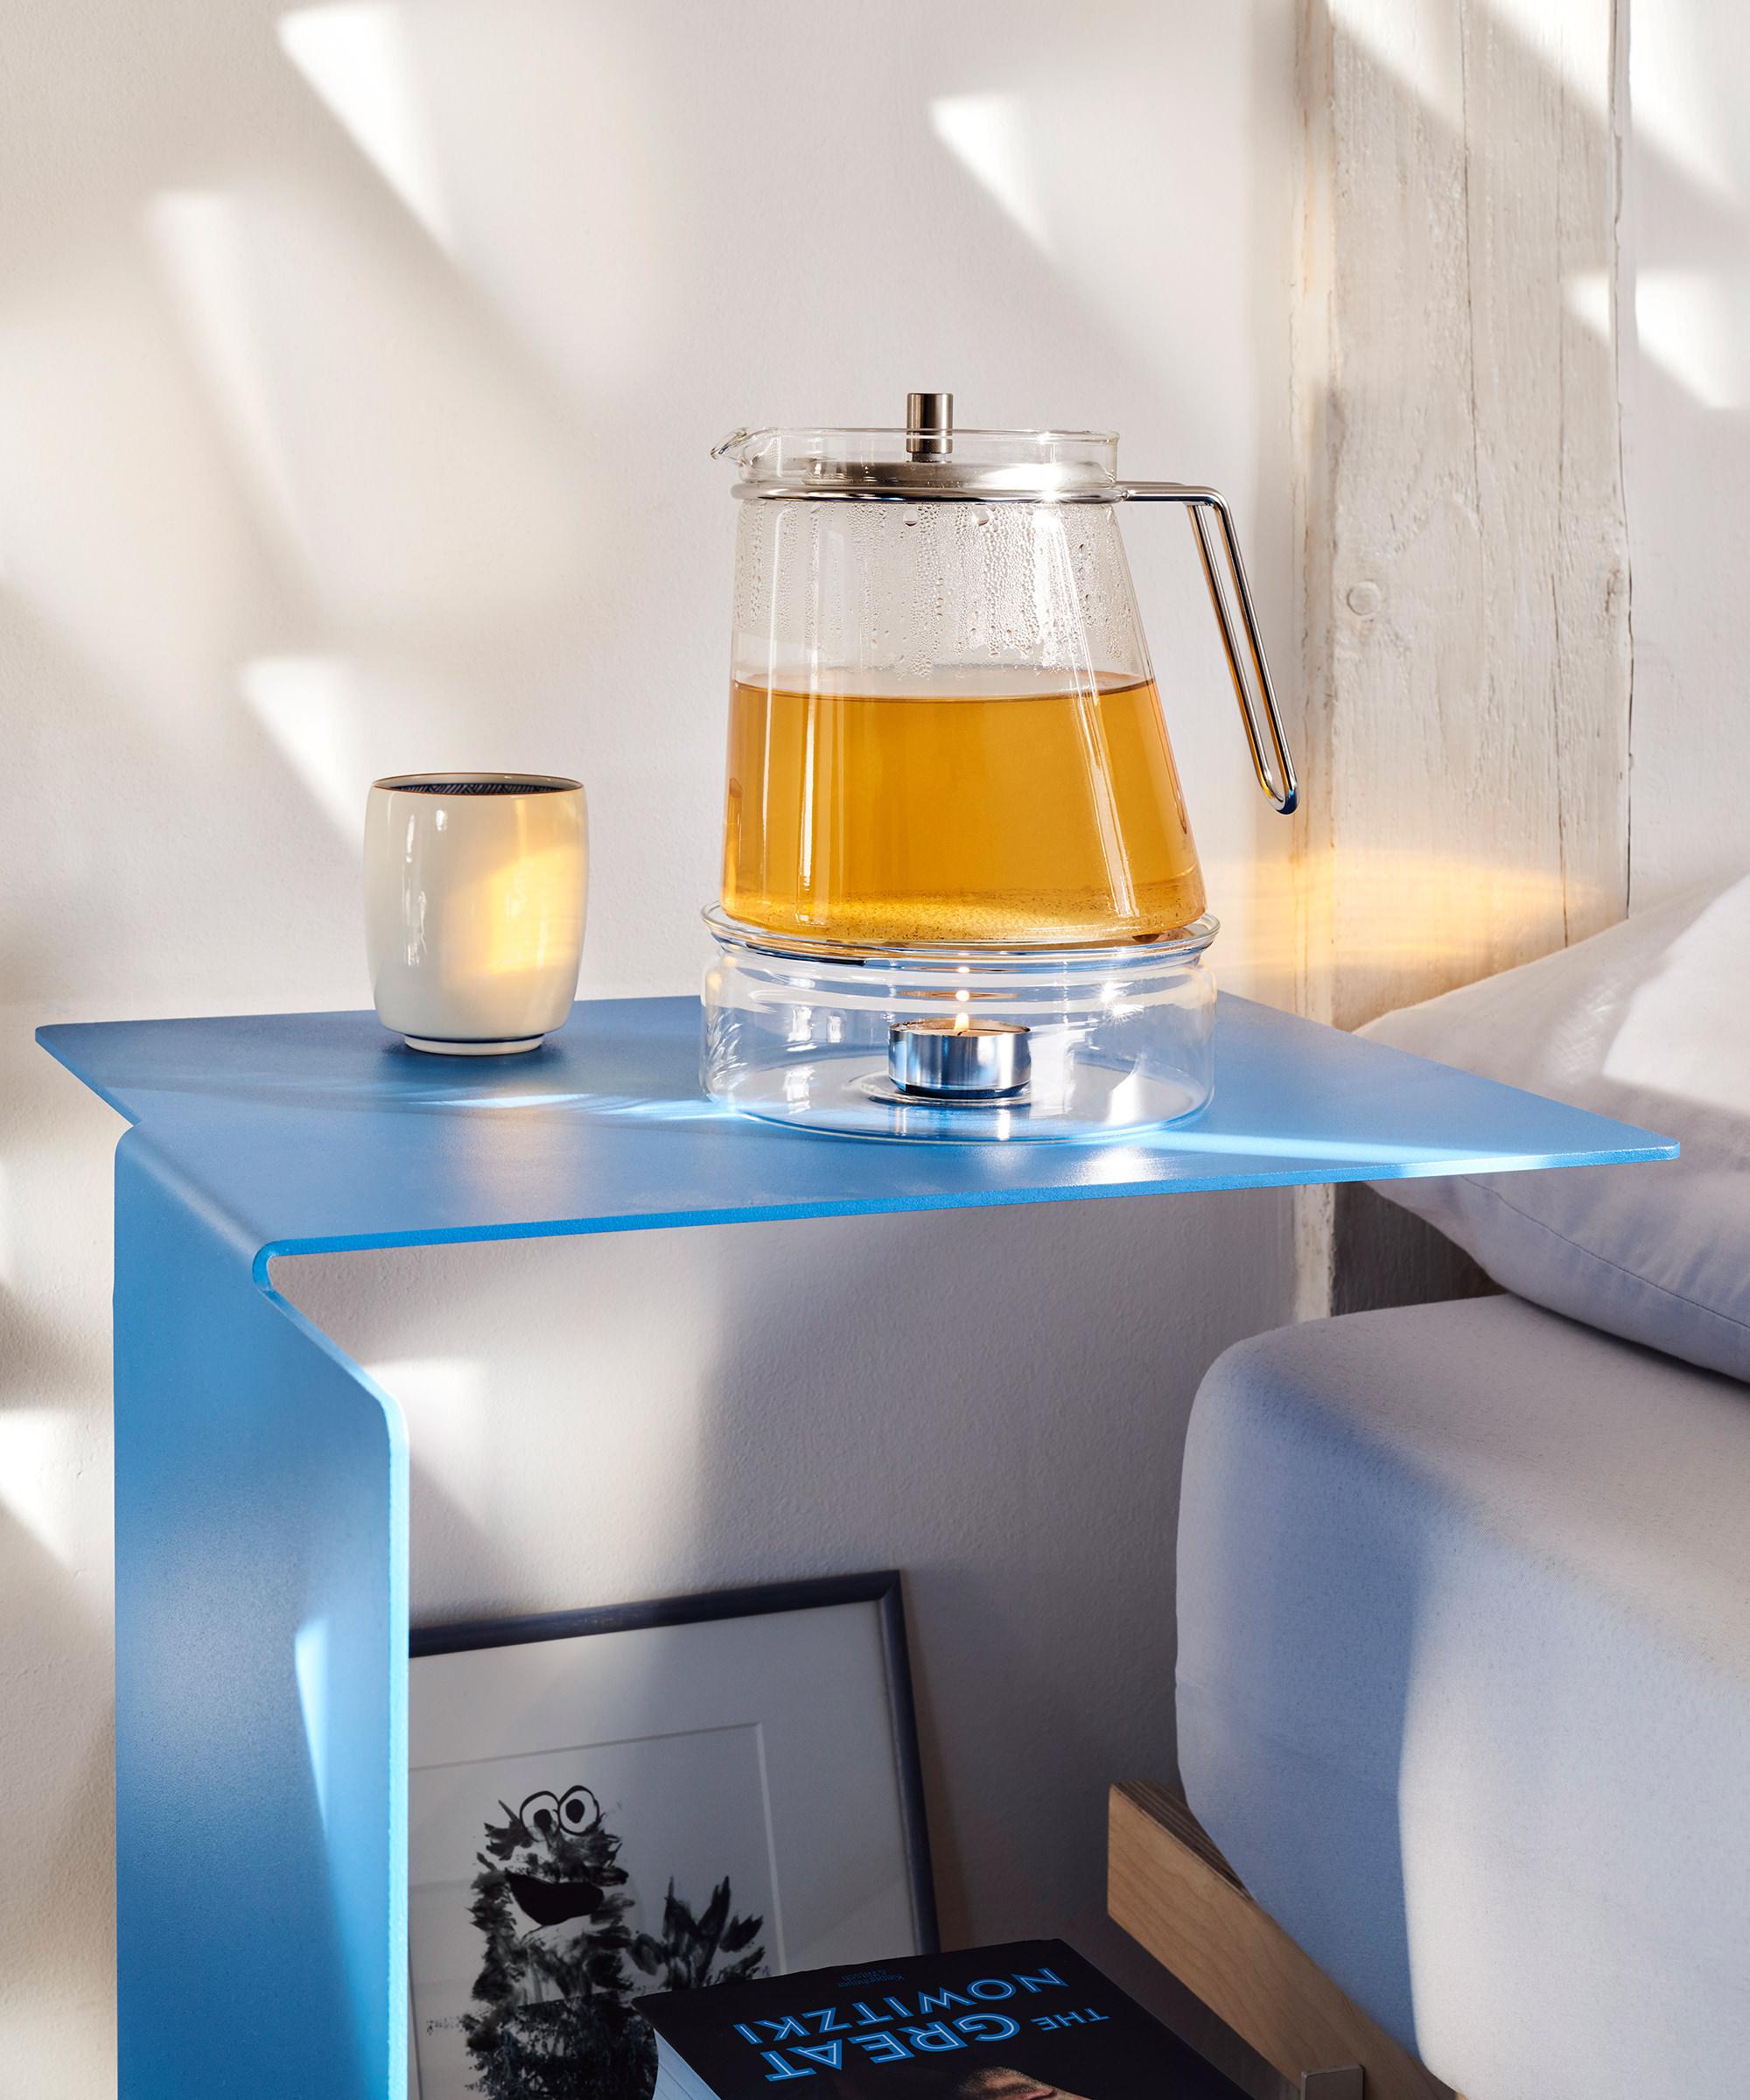 33300 Mono Ellipse Teekanne Teapot 02